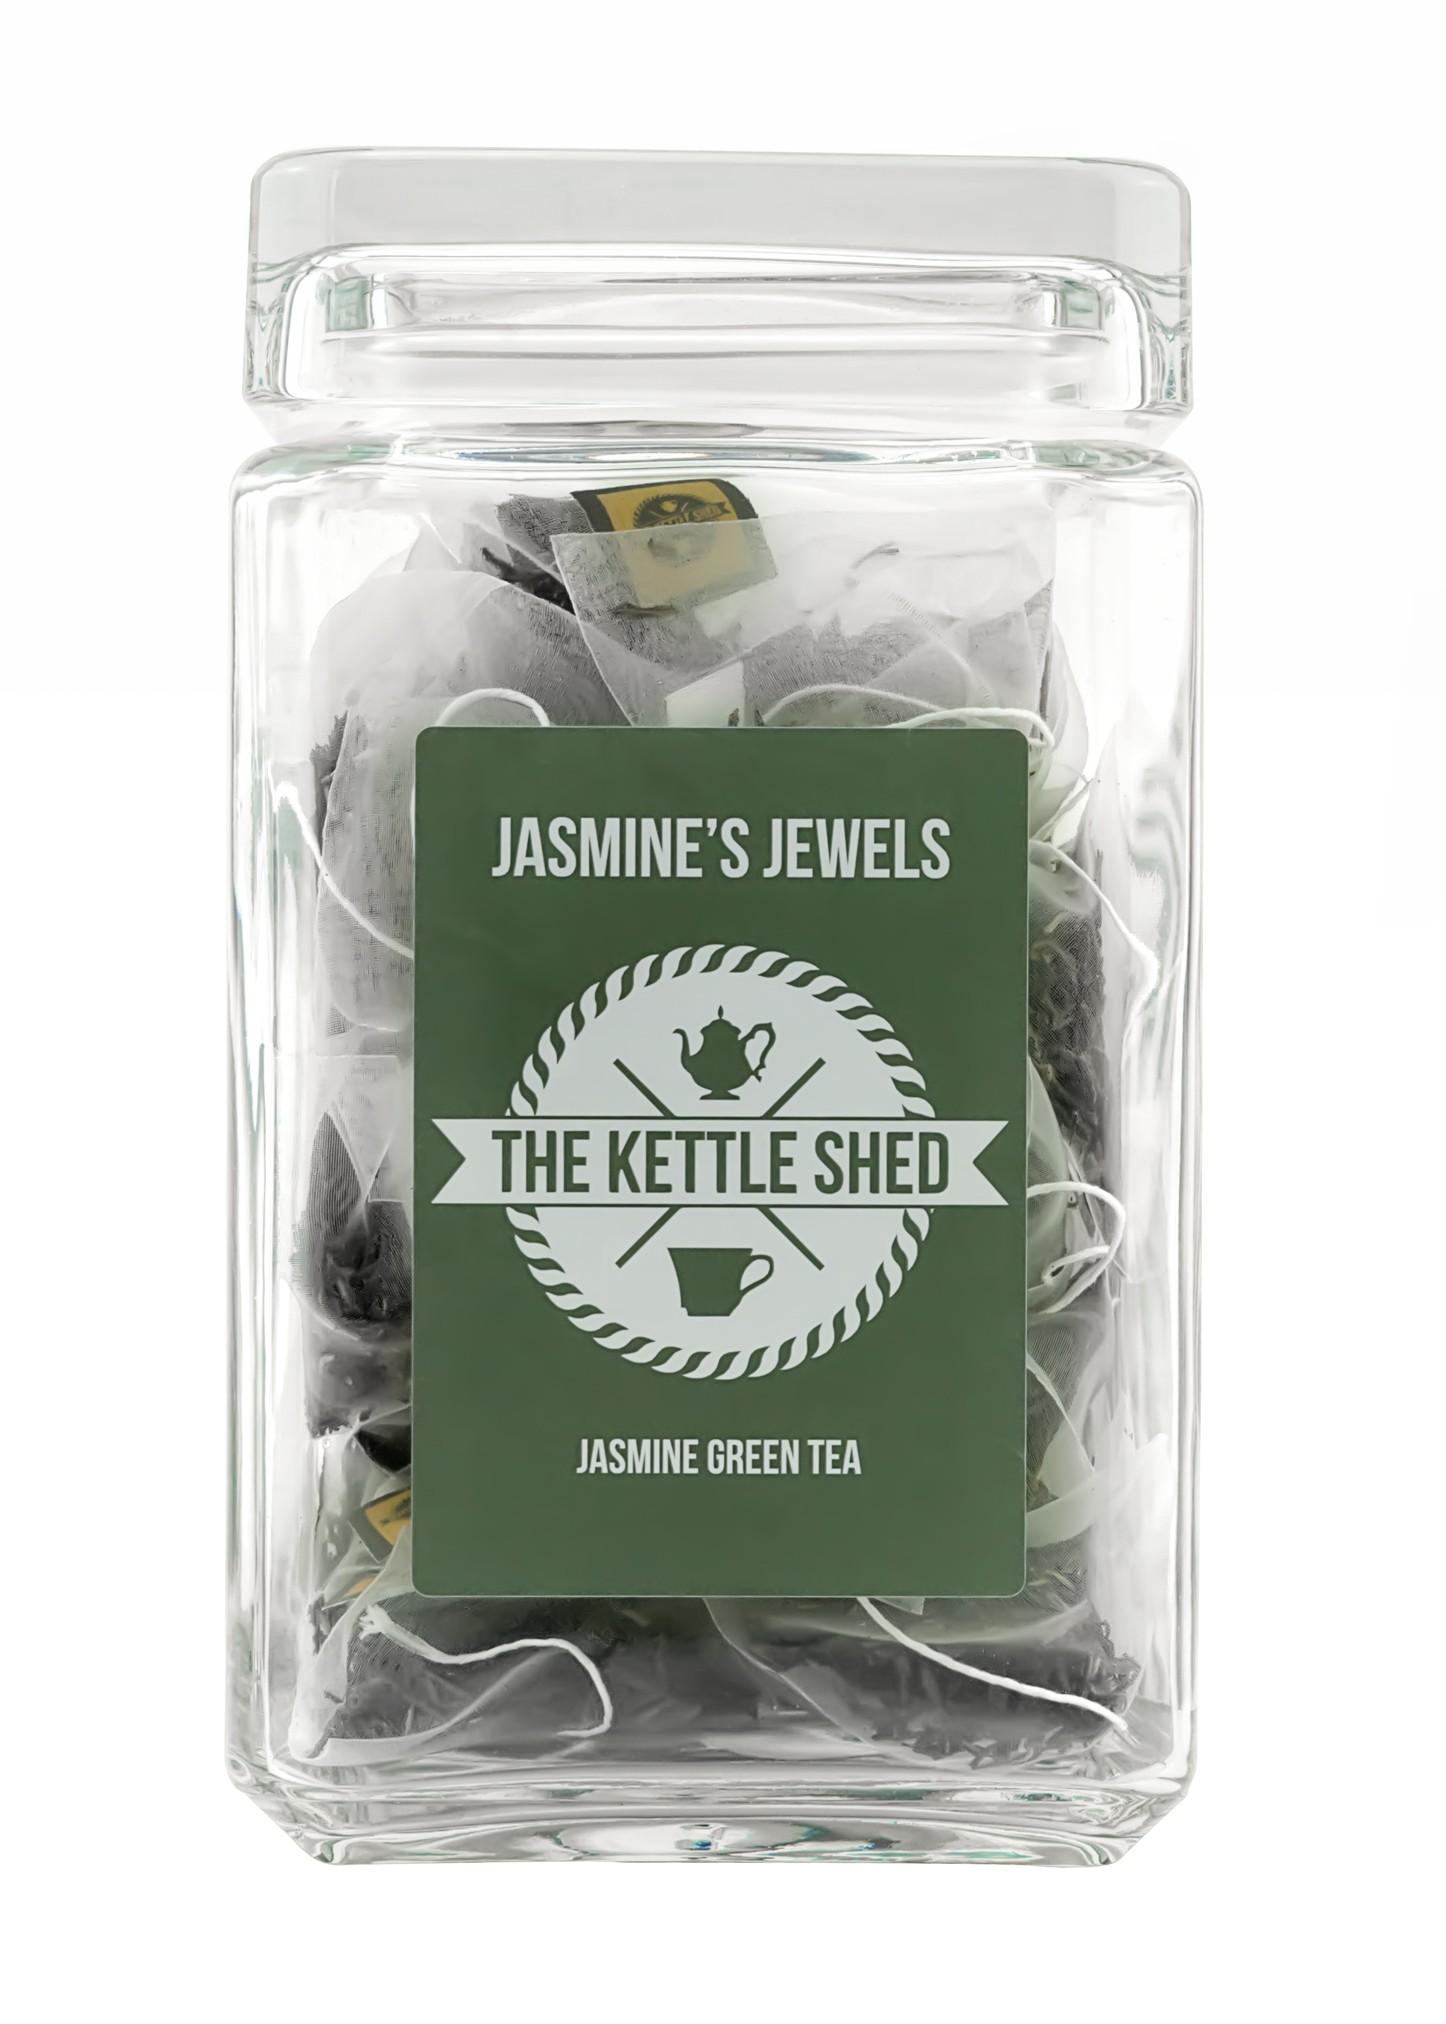 Jasmines Jewels - Glass Display Jar (without tea)